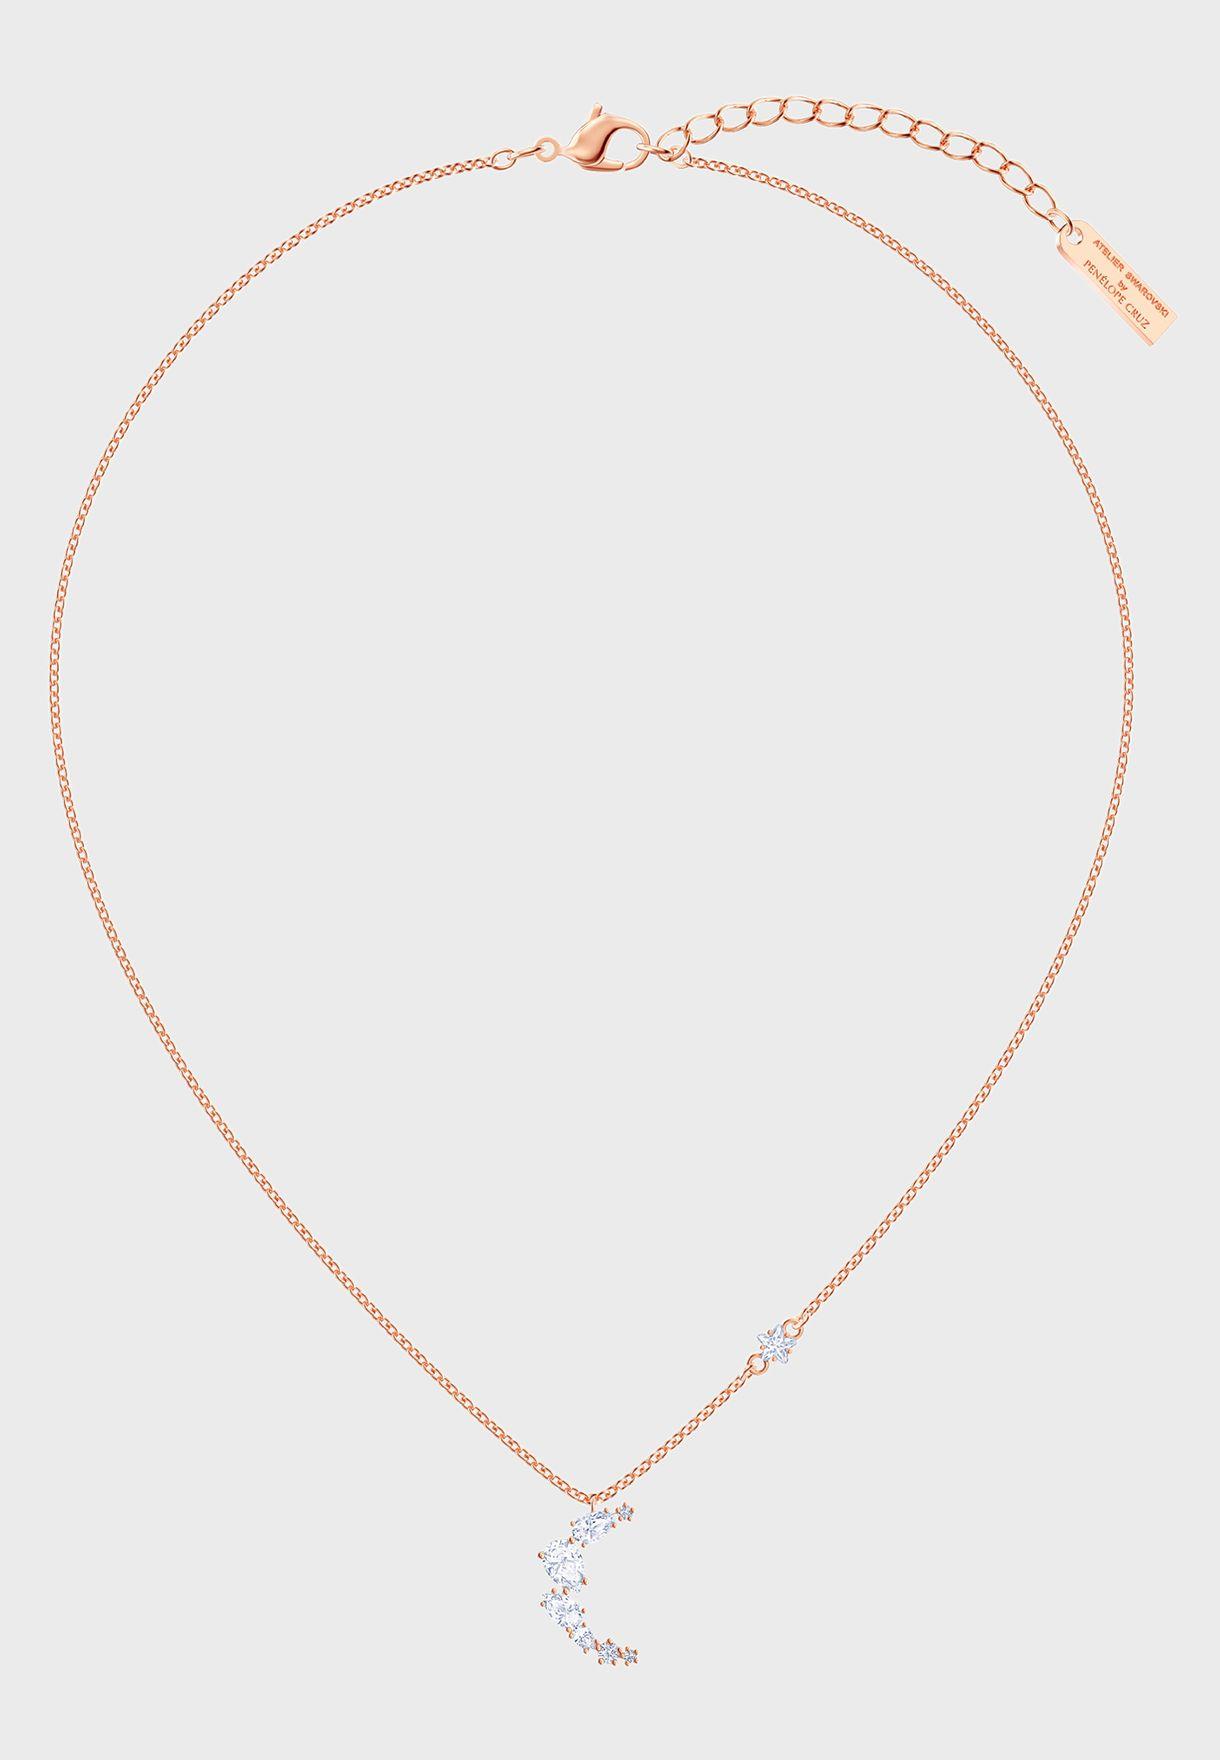 Moonsun Moon Pendant Necklace